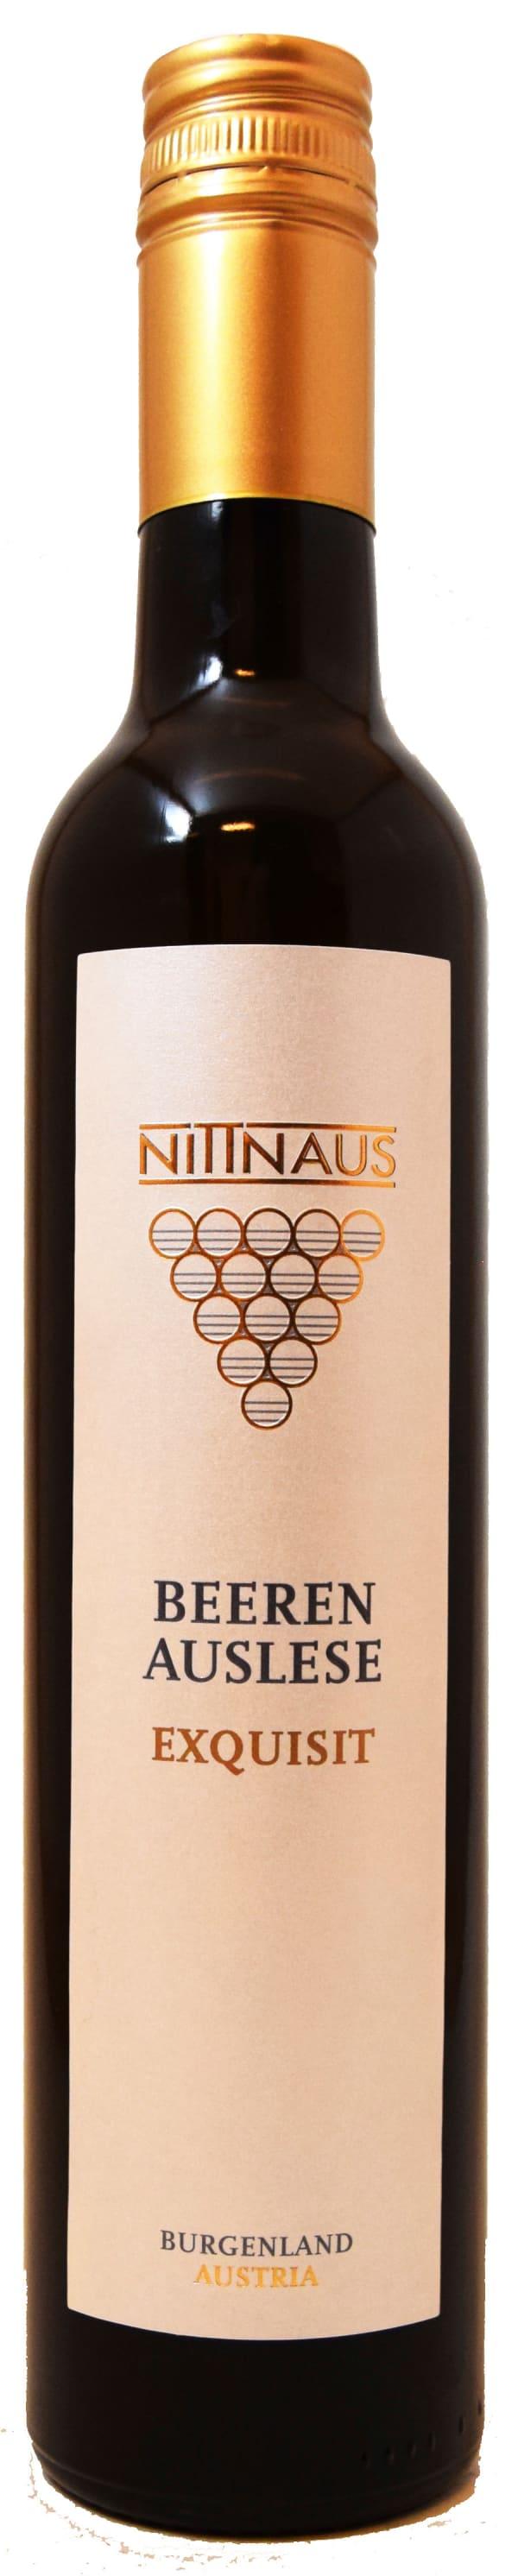 Nittnaus Beerenauslese Exquisit 2017